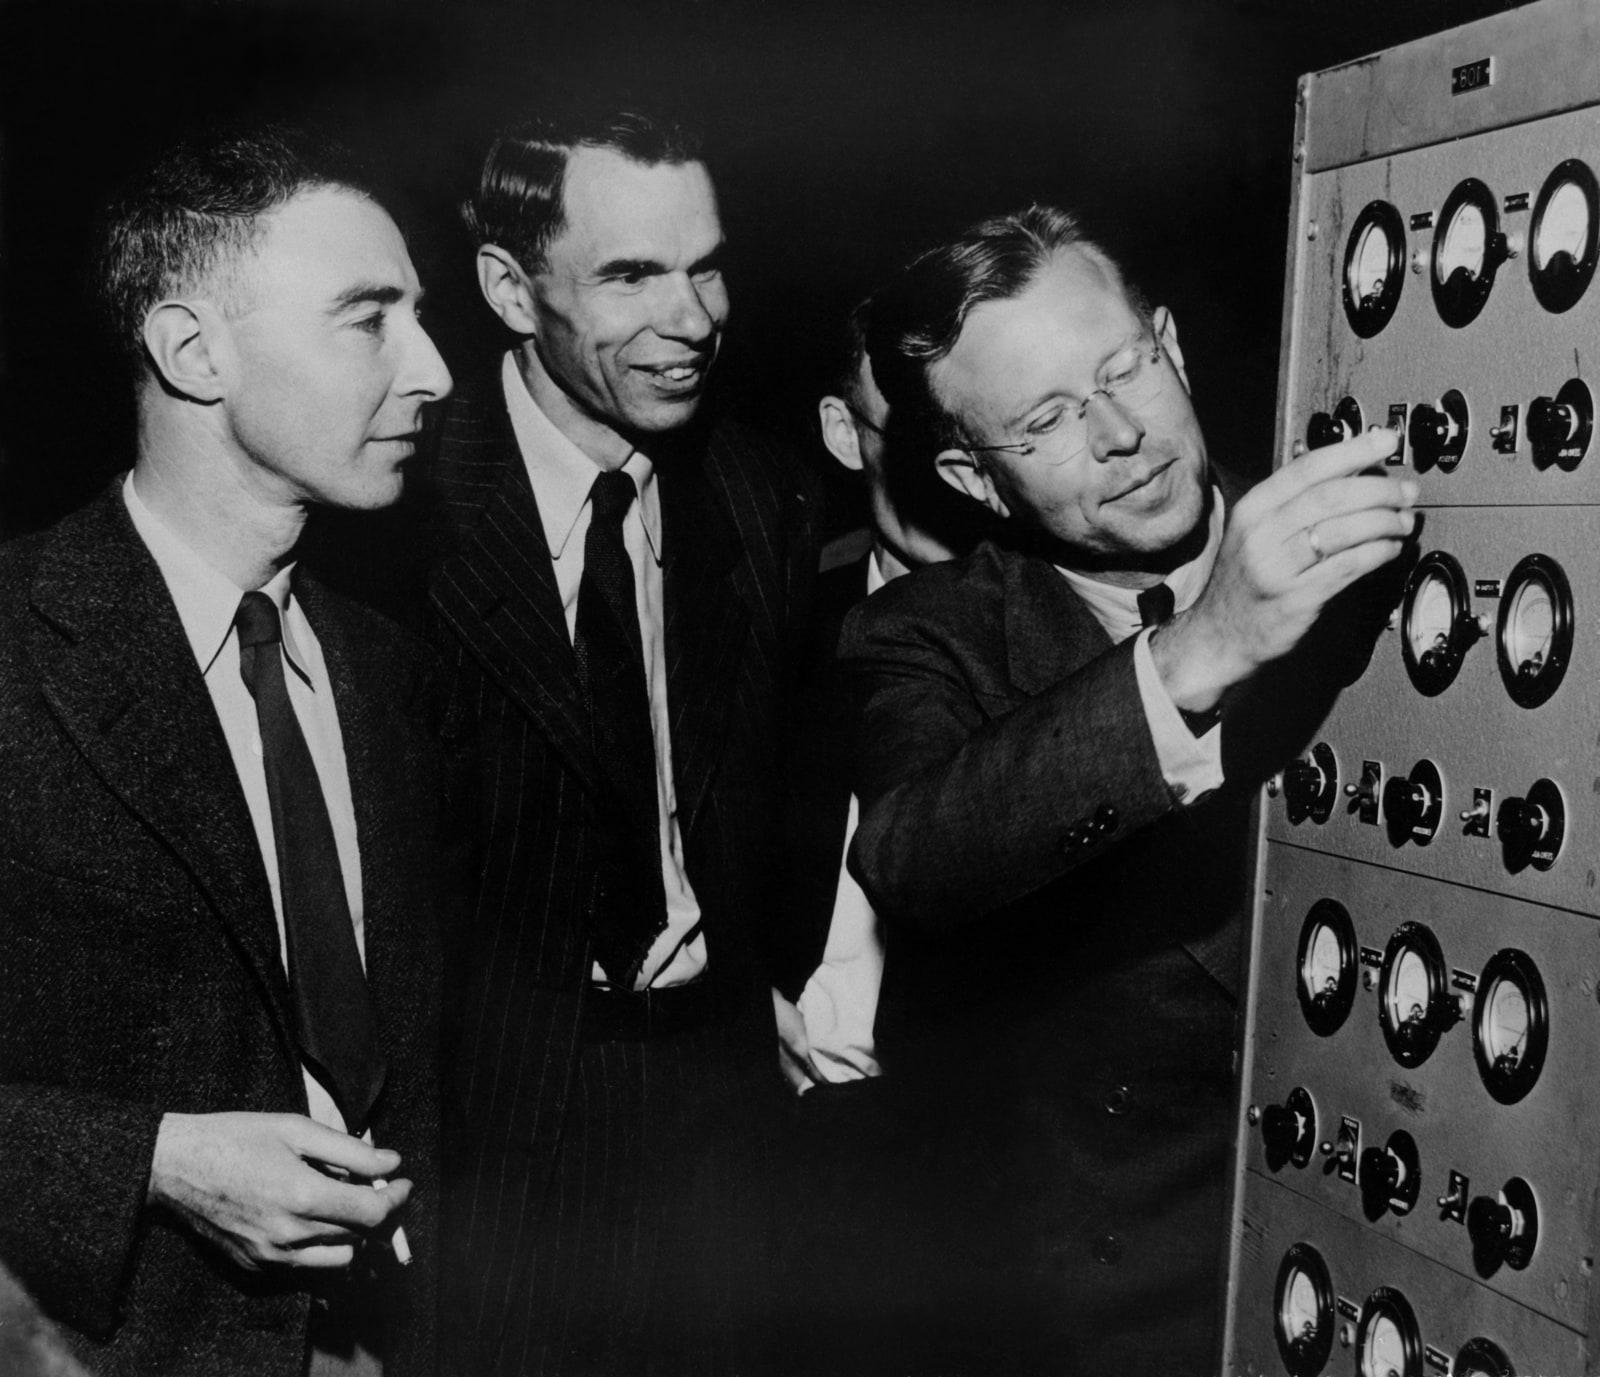 ernest o lawrence glenn t seaborg and j robert oppenheimer in early 1946 at 21731c 1600